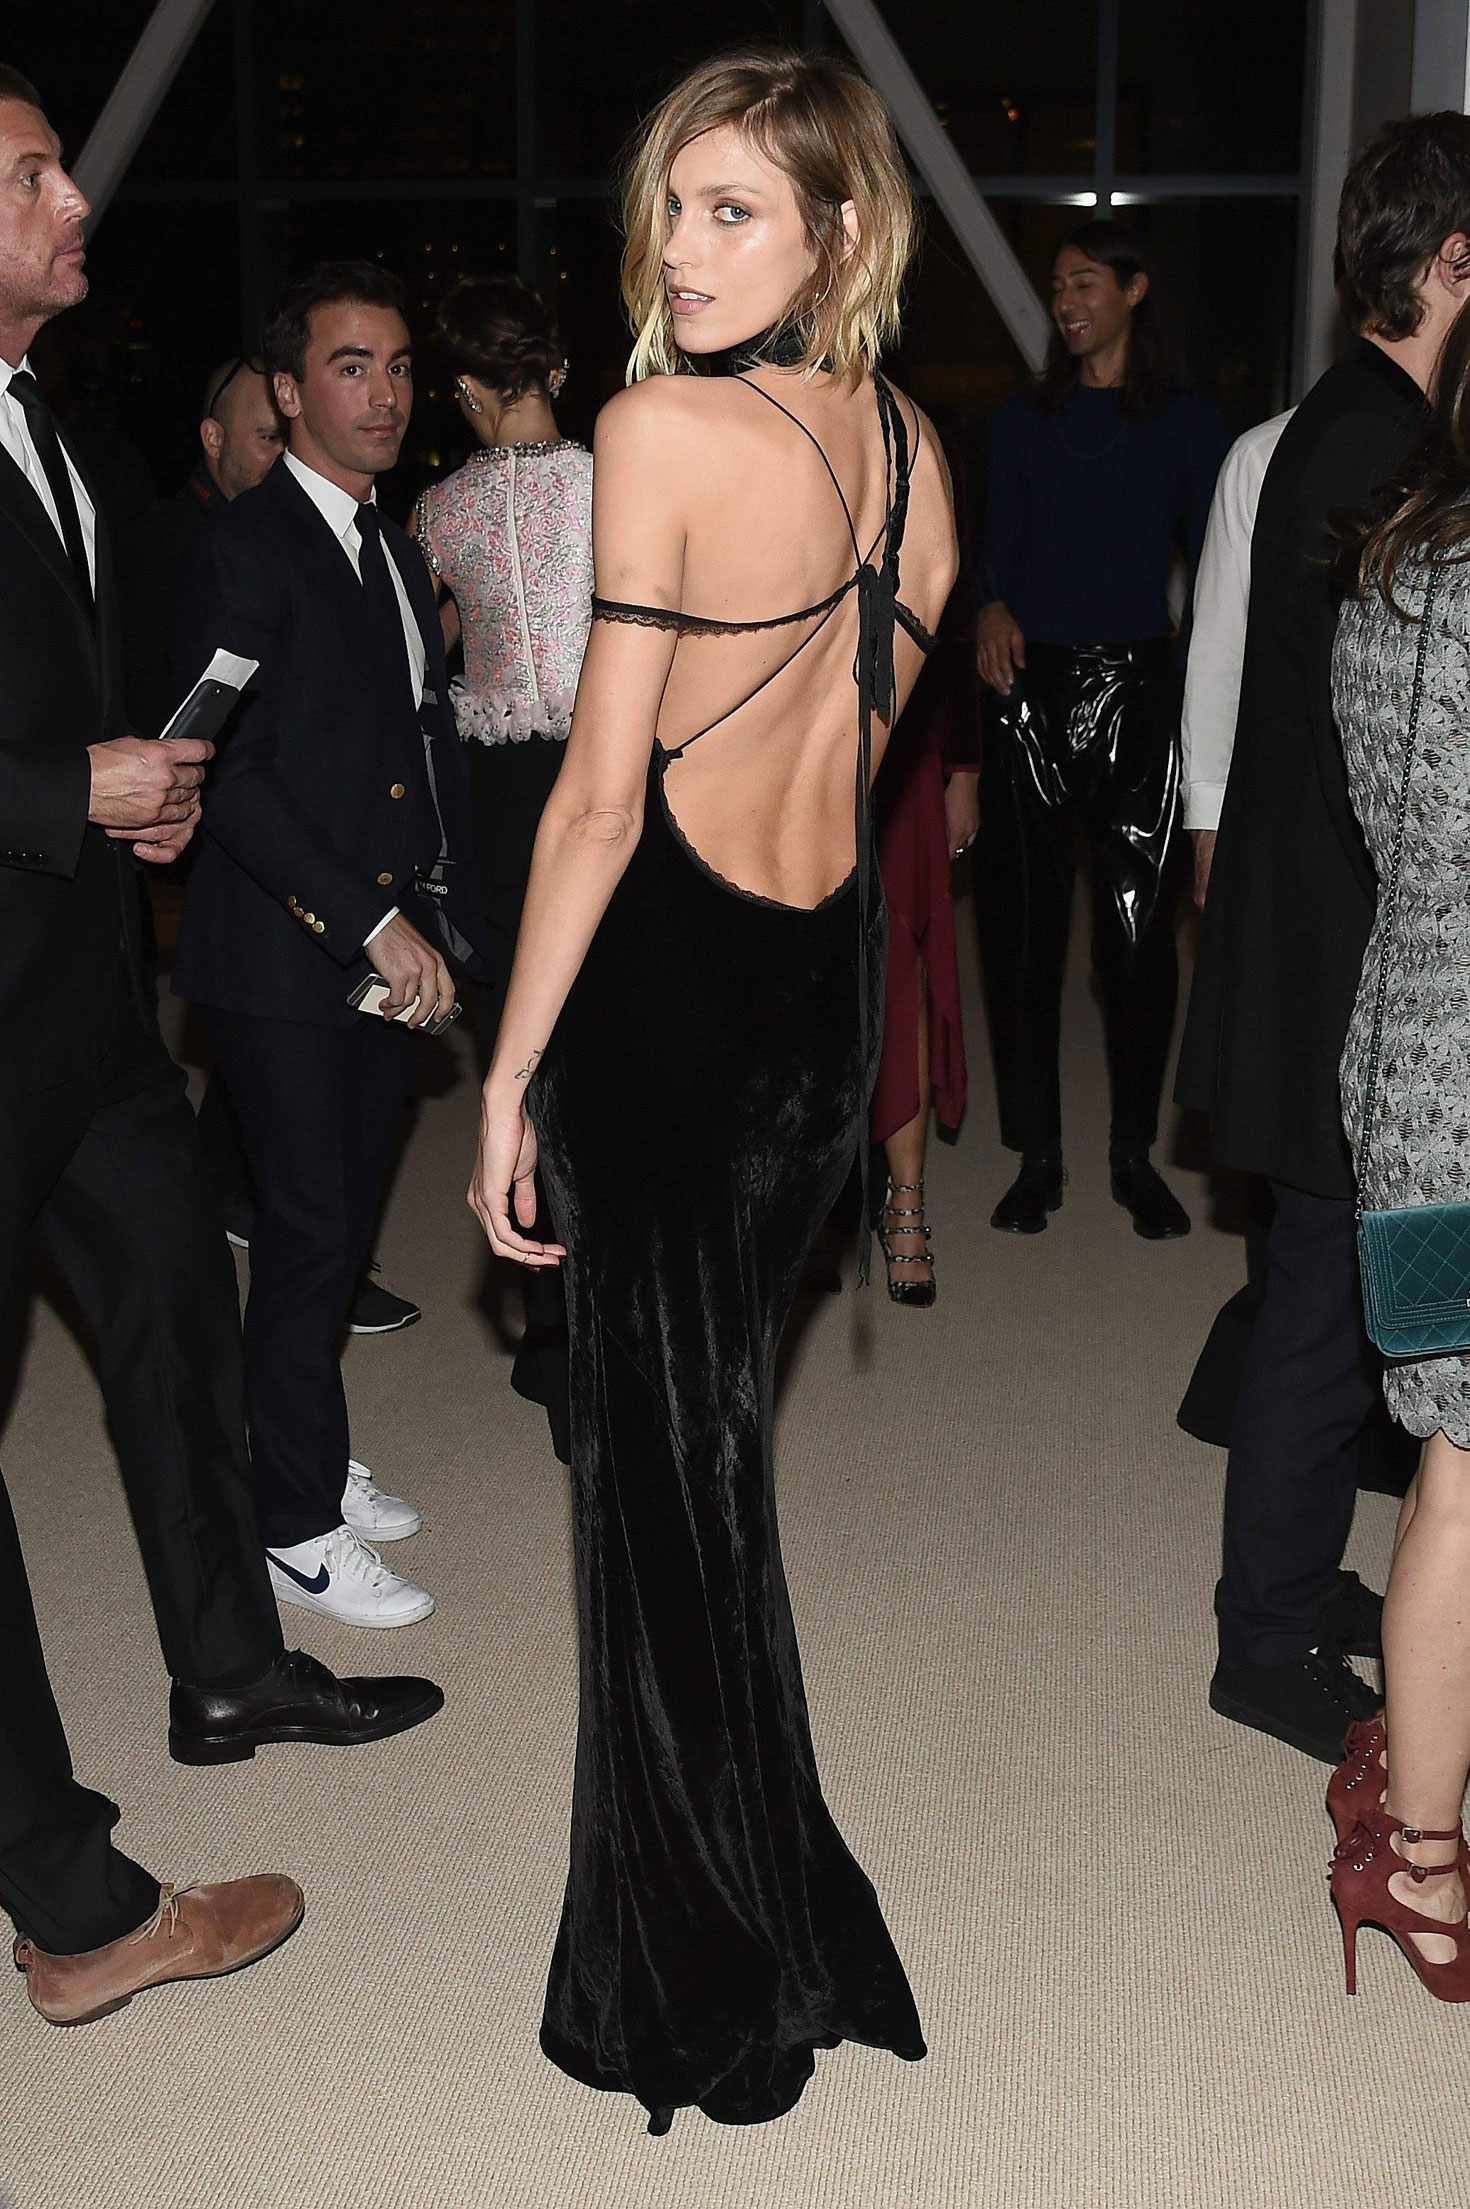 Anja Rubik Hot Gala Dress Images — Celeb Lives